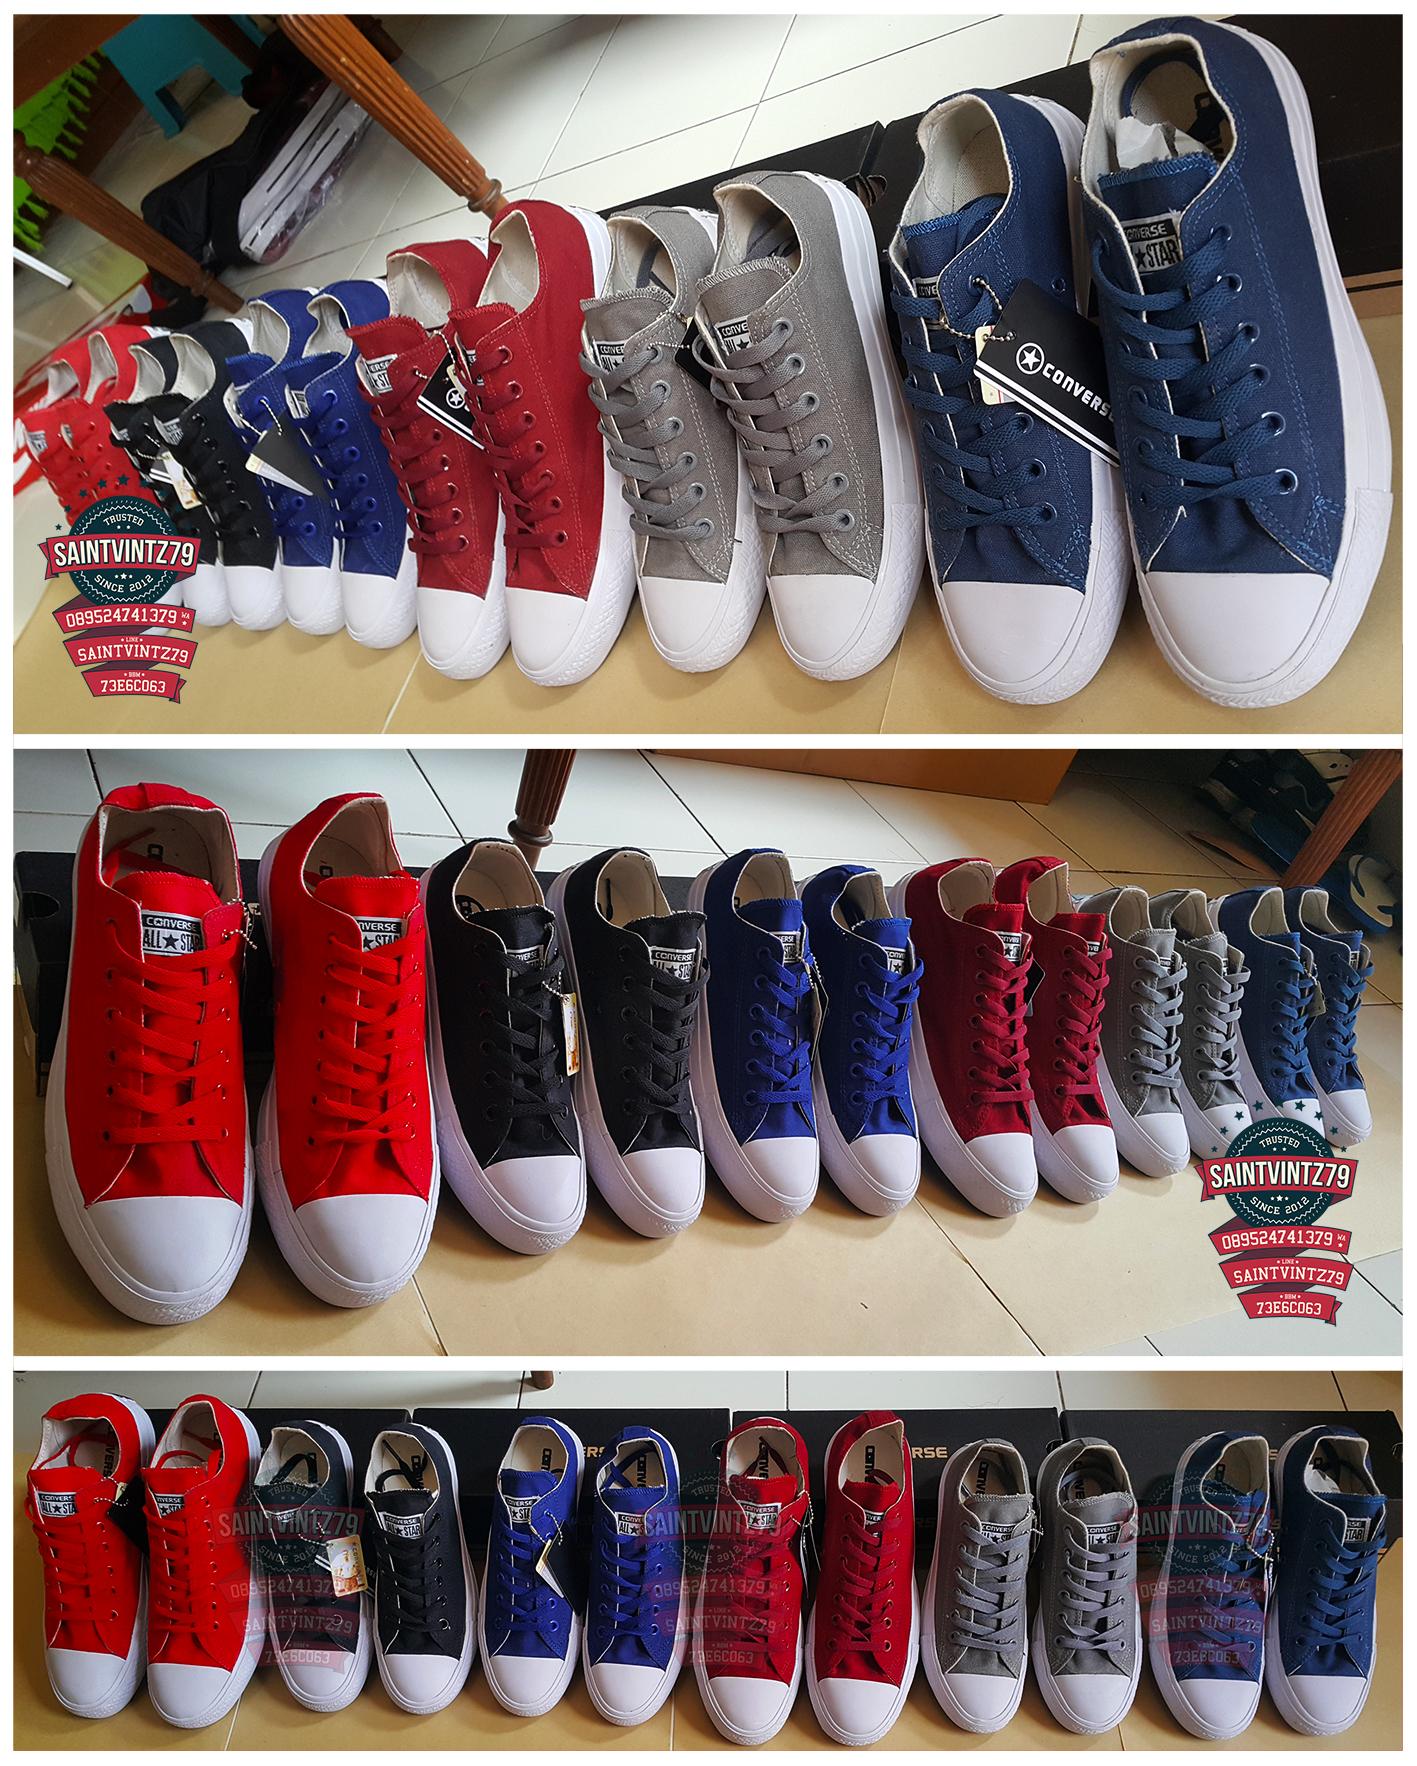 Jual Sepatu Converse All Stars II Grade Ori asli Pabrik - SaintVintz79 ... 53211d0230